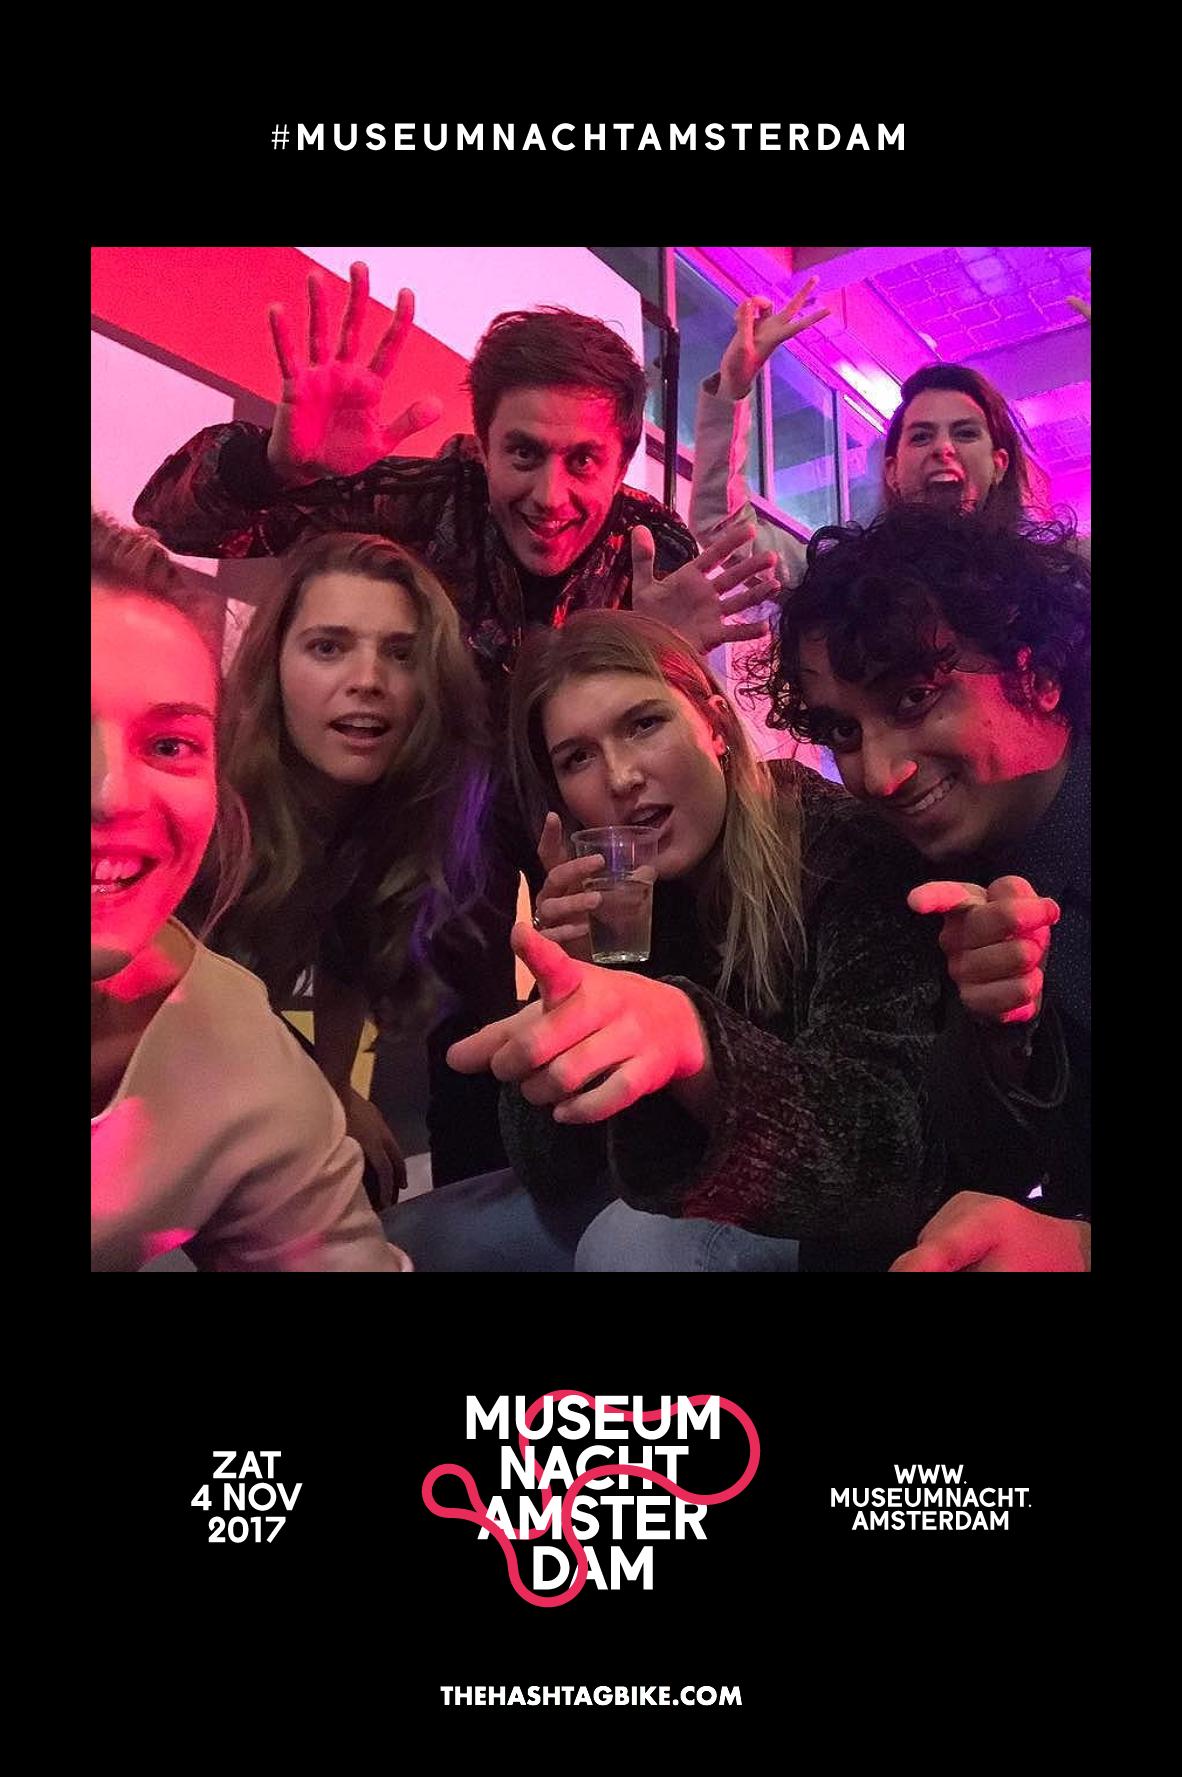 museumnacht_thehashtagbike14.png